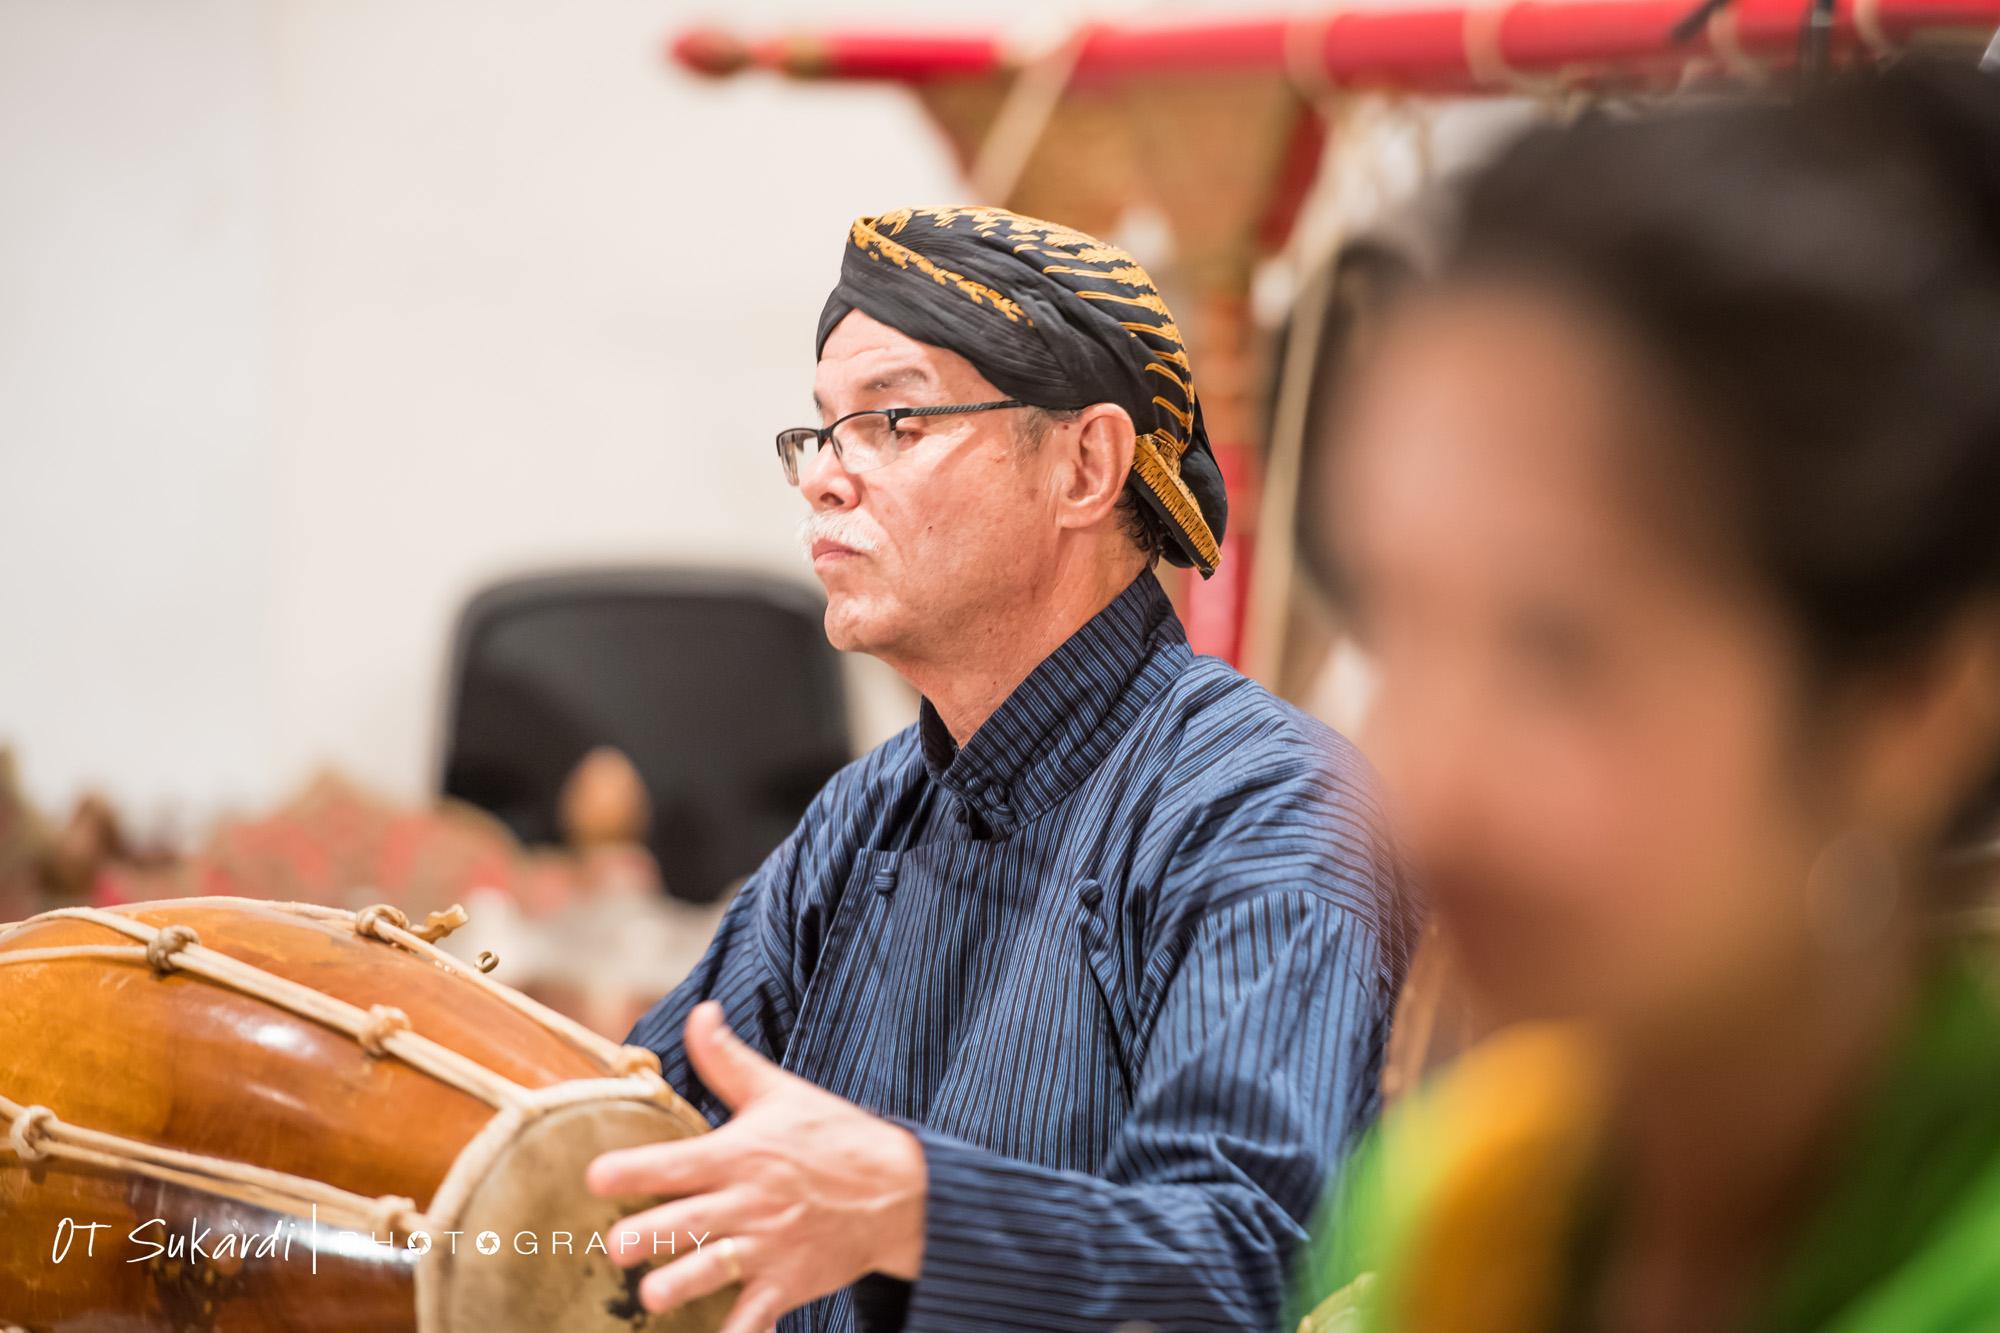 close up of man playing drum